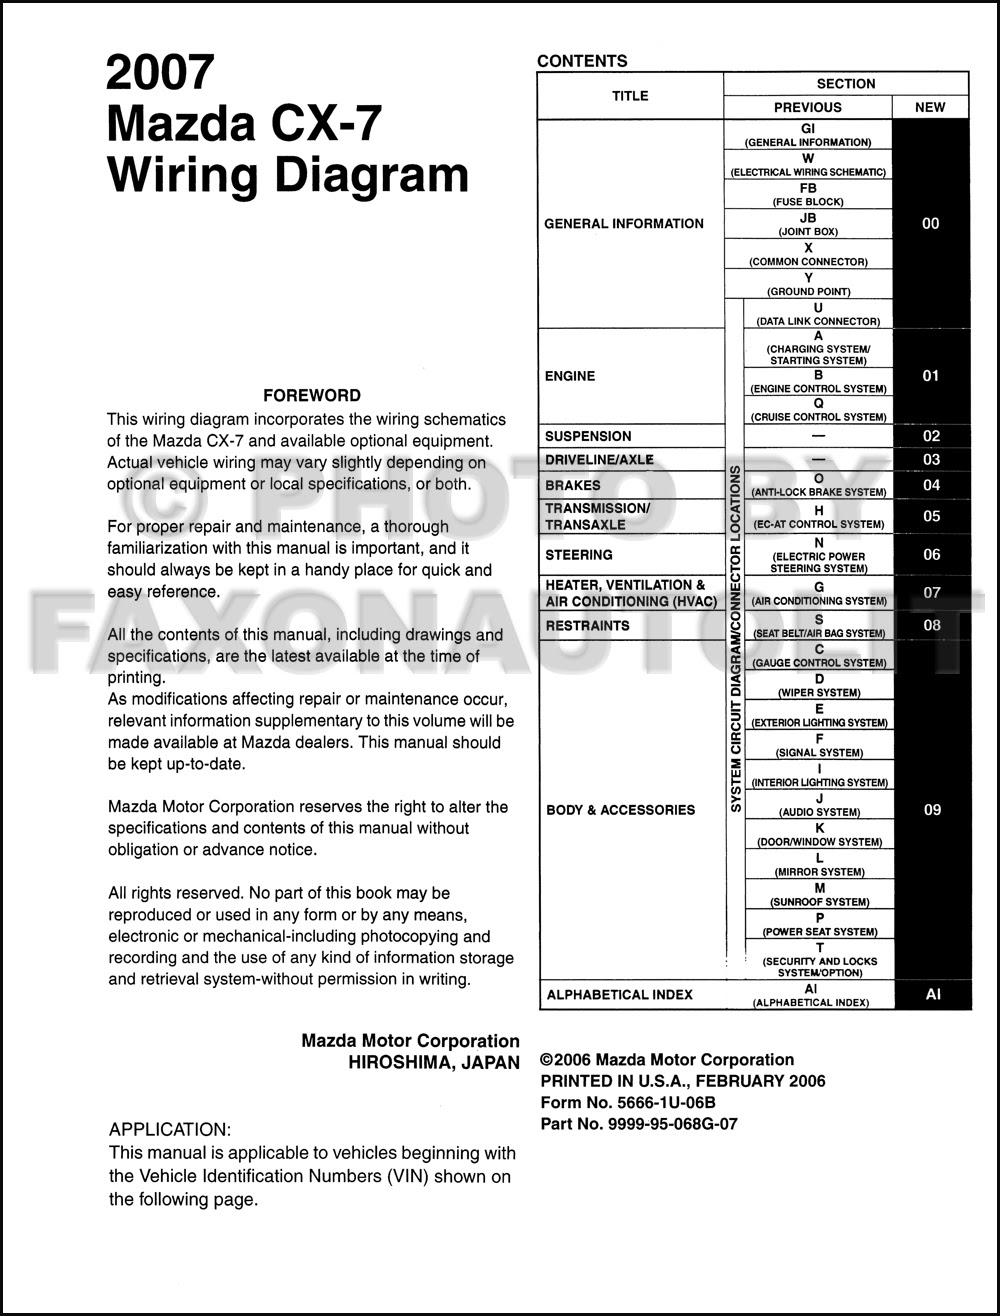 2008 Mazda Cx 7 Wiring Diagram Manual Full Hd Version Diagram Manual Shah Yti Fr